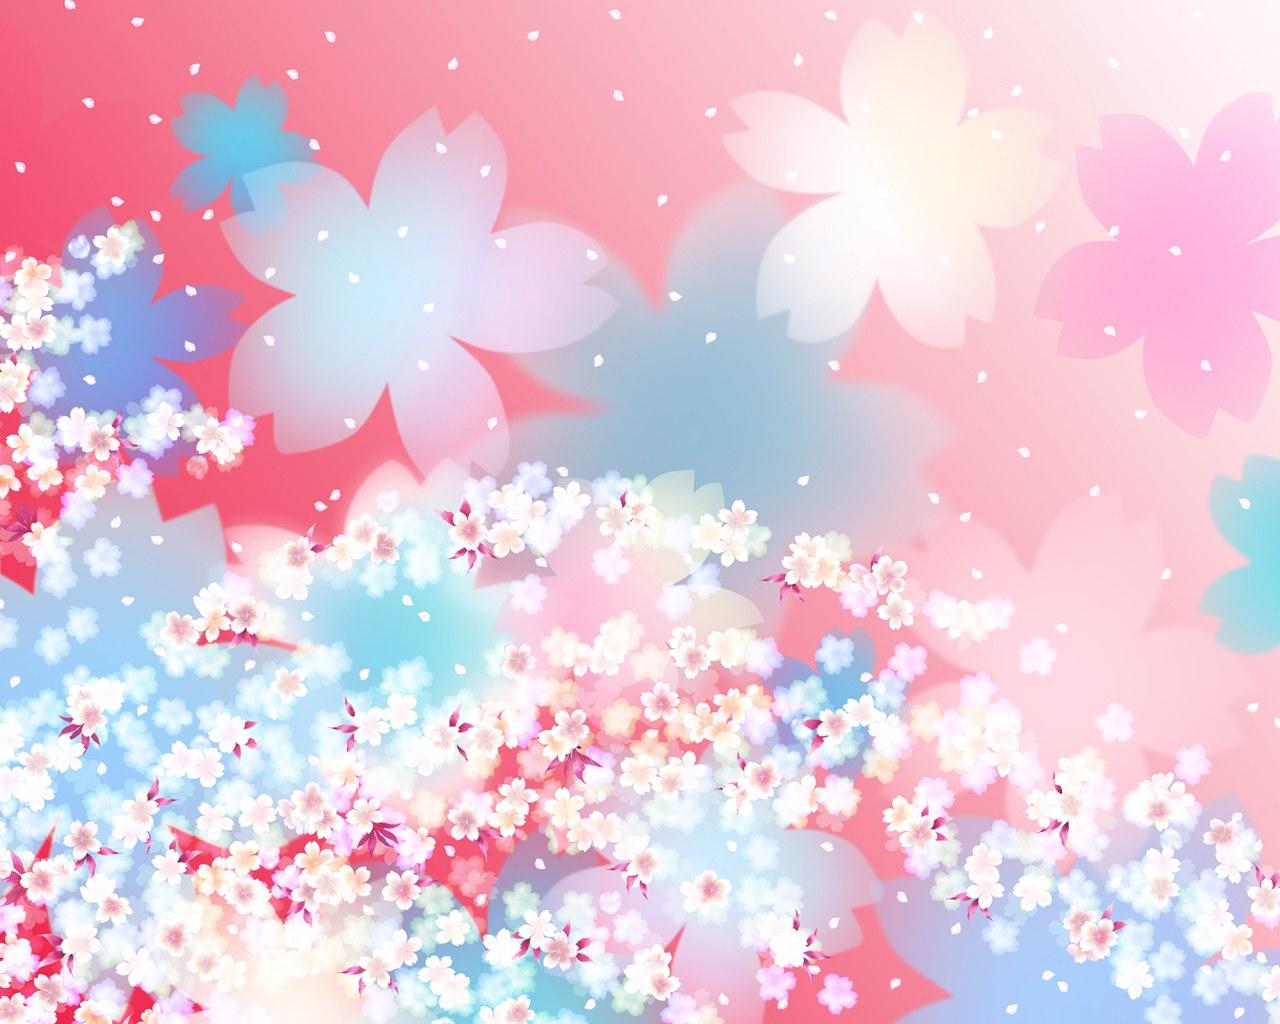 japanese wallpaper designs 1280x1024